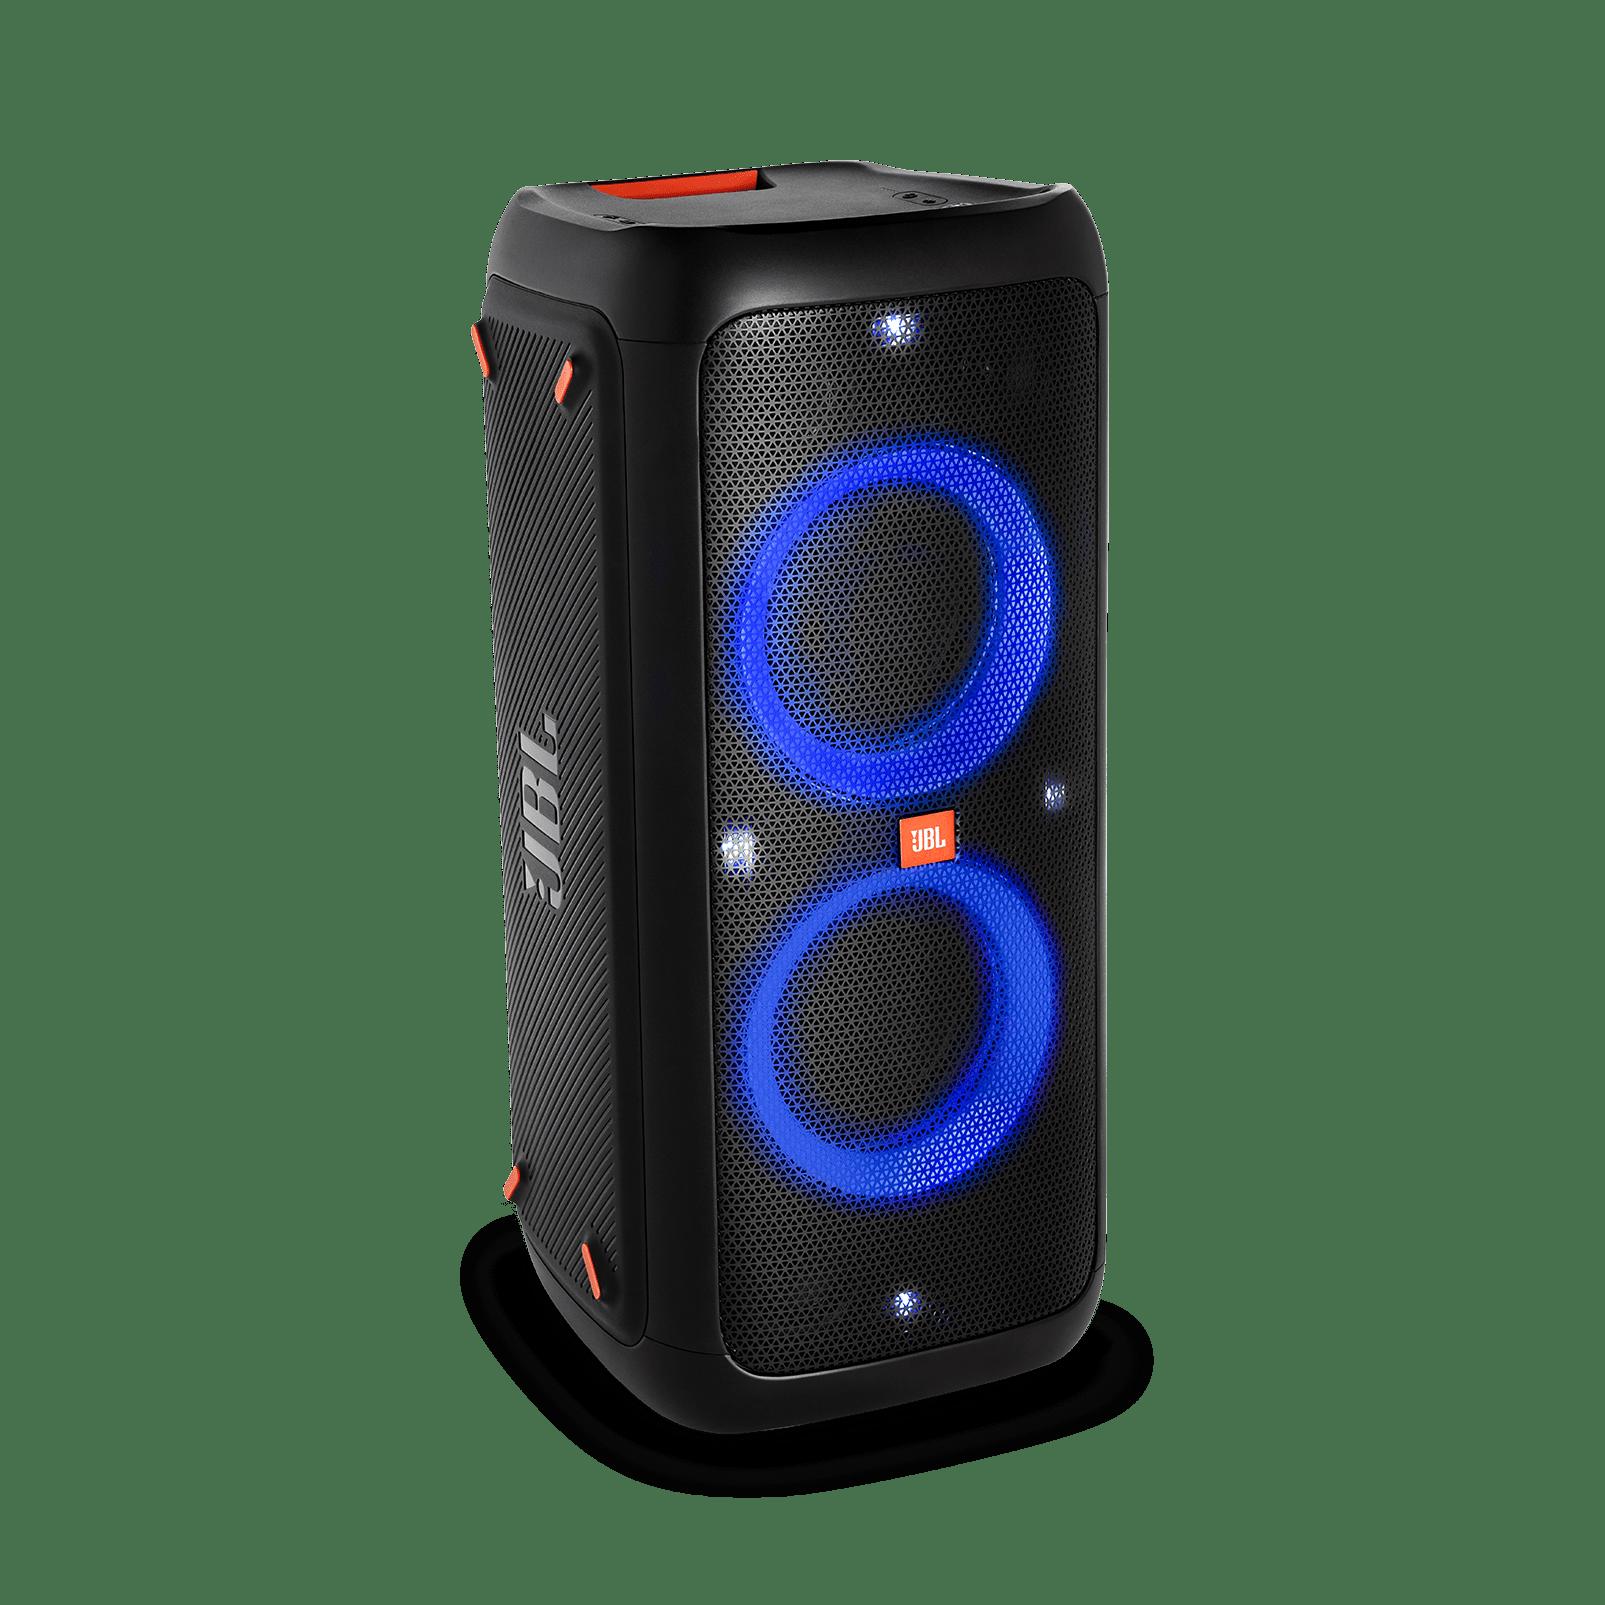 JBL PartyBox 300 Premium High Power Portable Wireless Bluetooth Audio System - Black